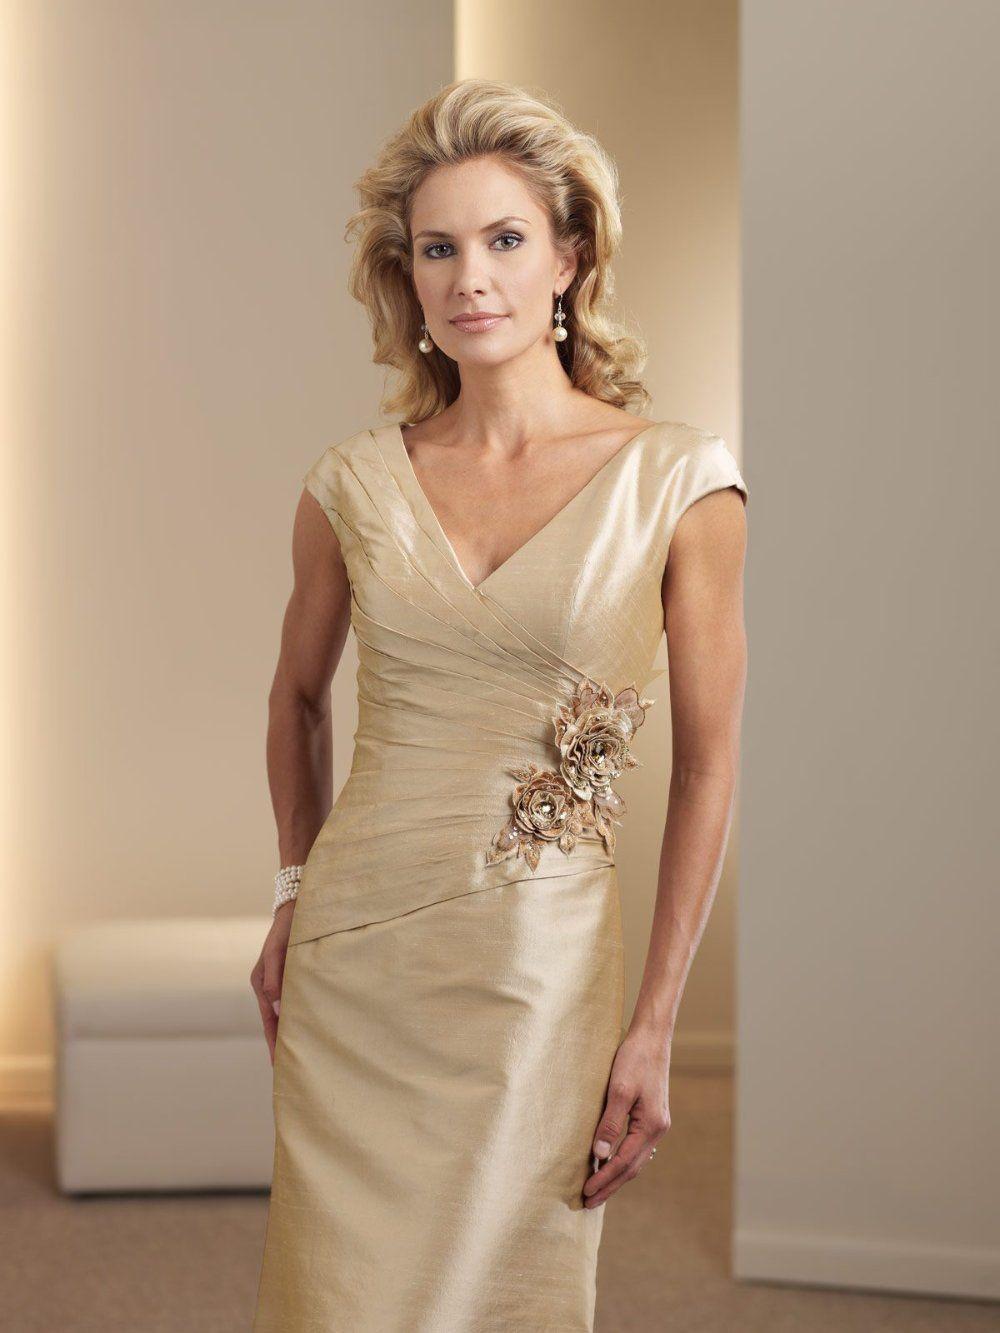 17 Best images about mother bride dresses on Pinterest - Suits ...